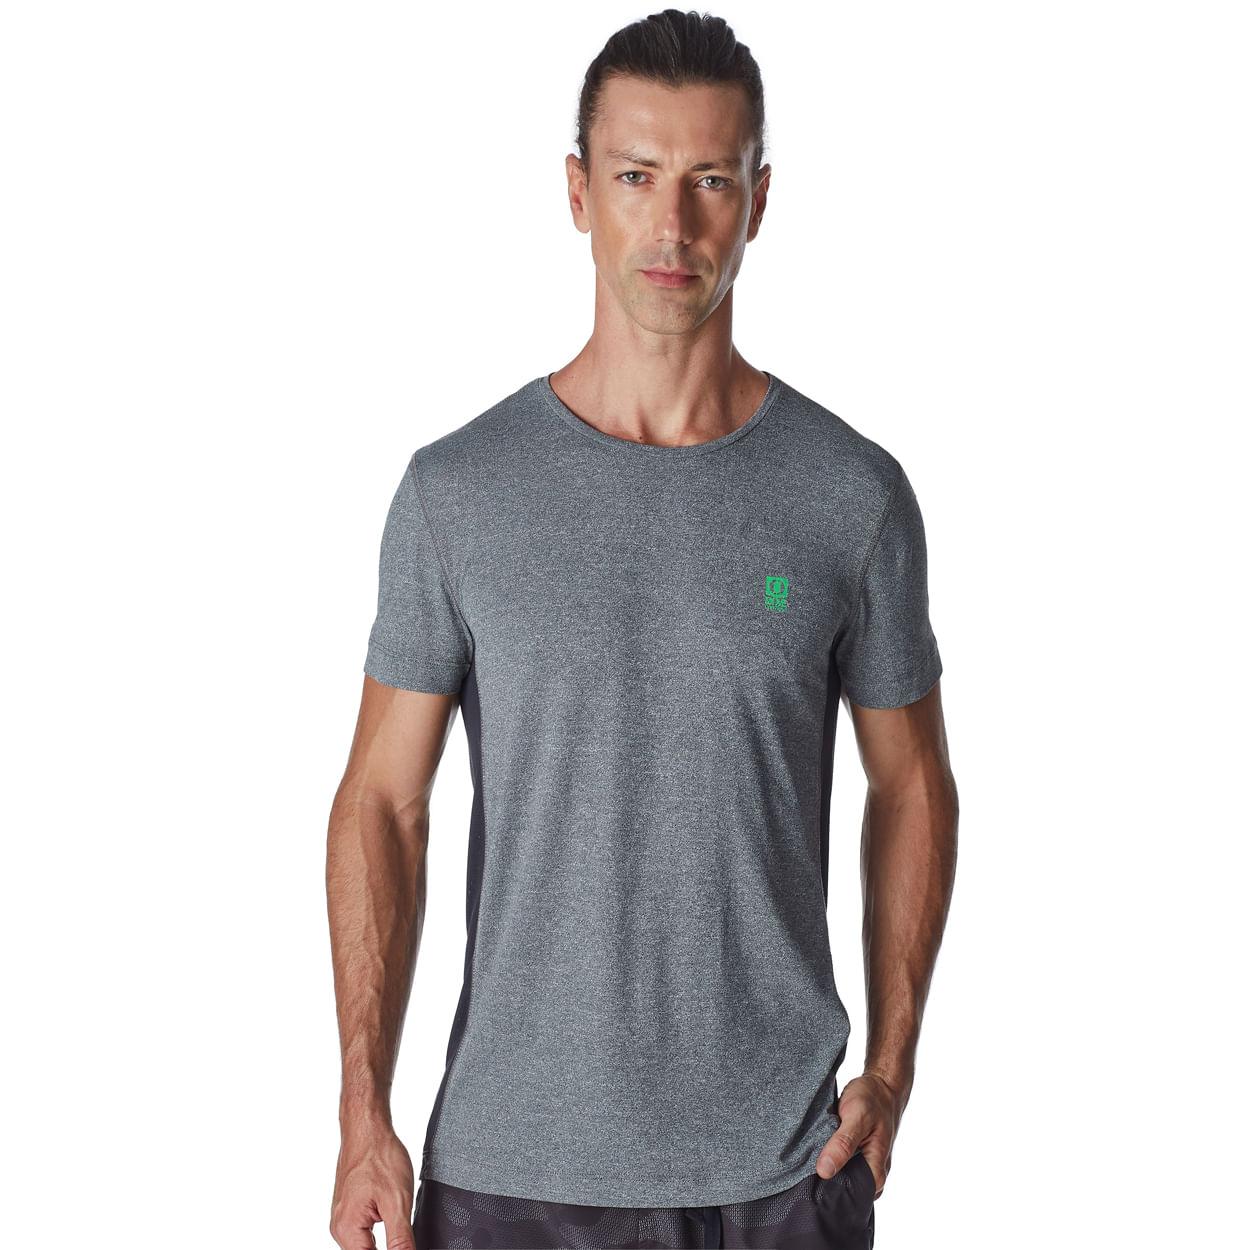 Camiseta-Fitness-Masculina-Convicto-com-Tecnologia-Truelife®-Dry